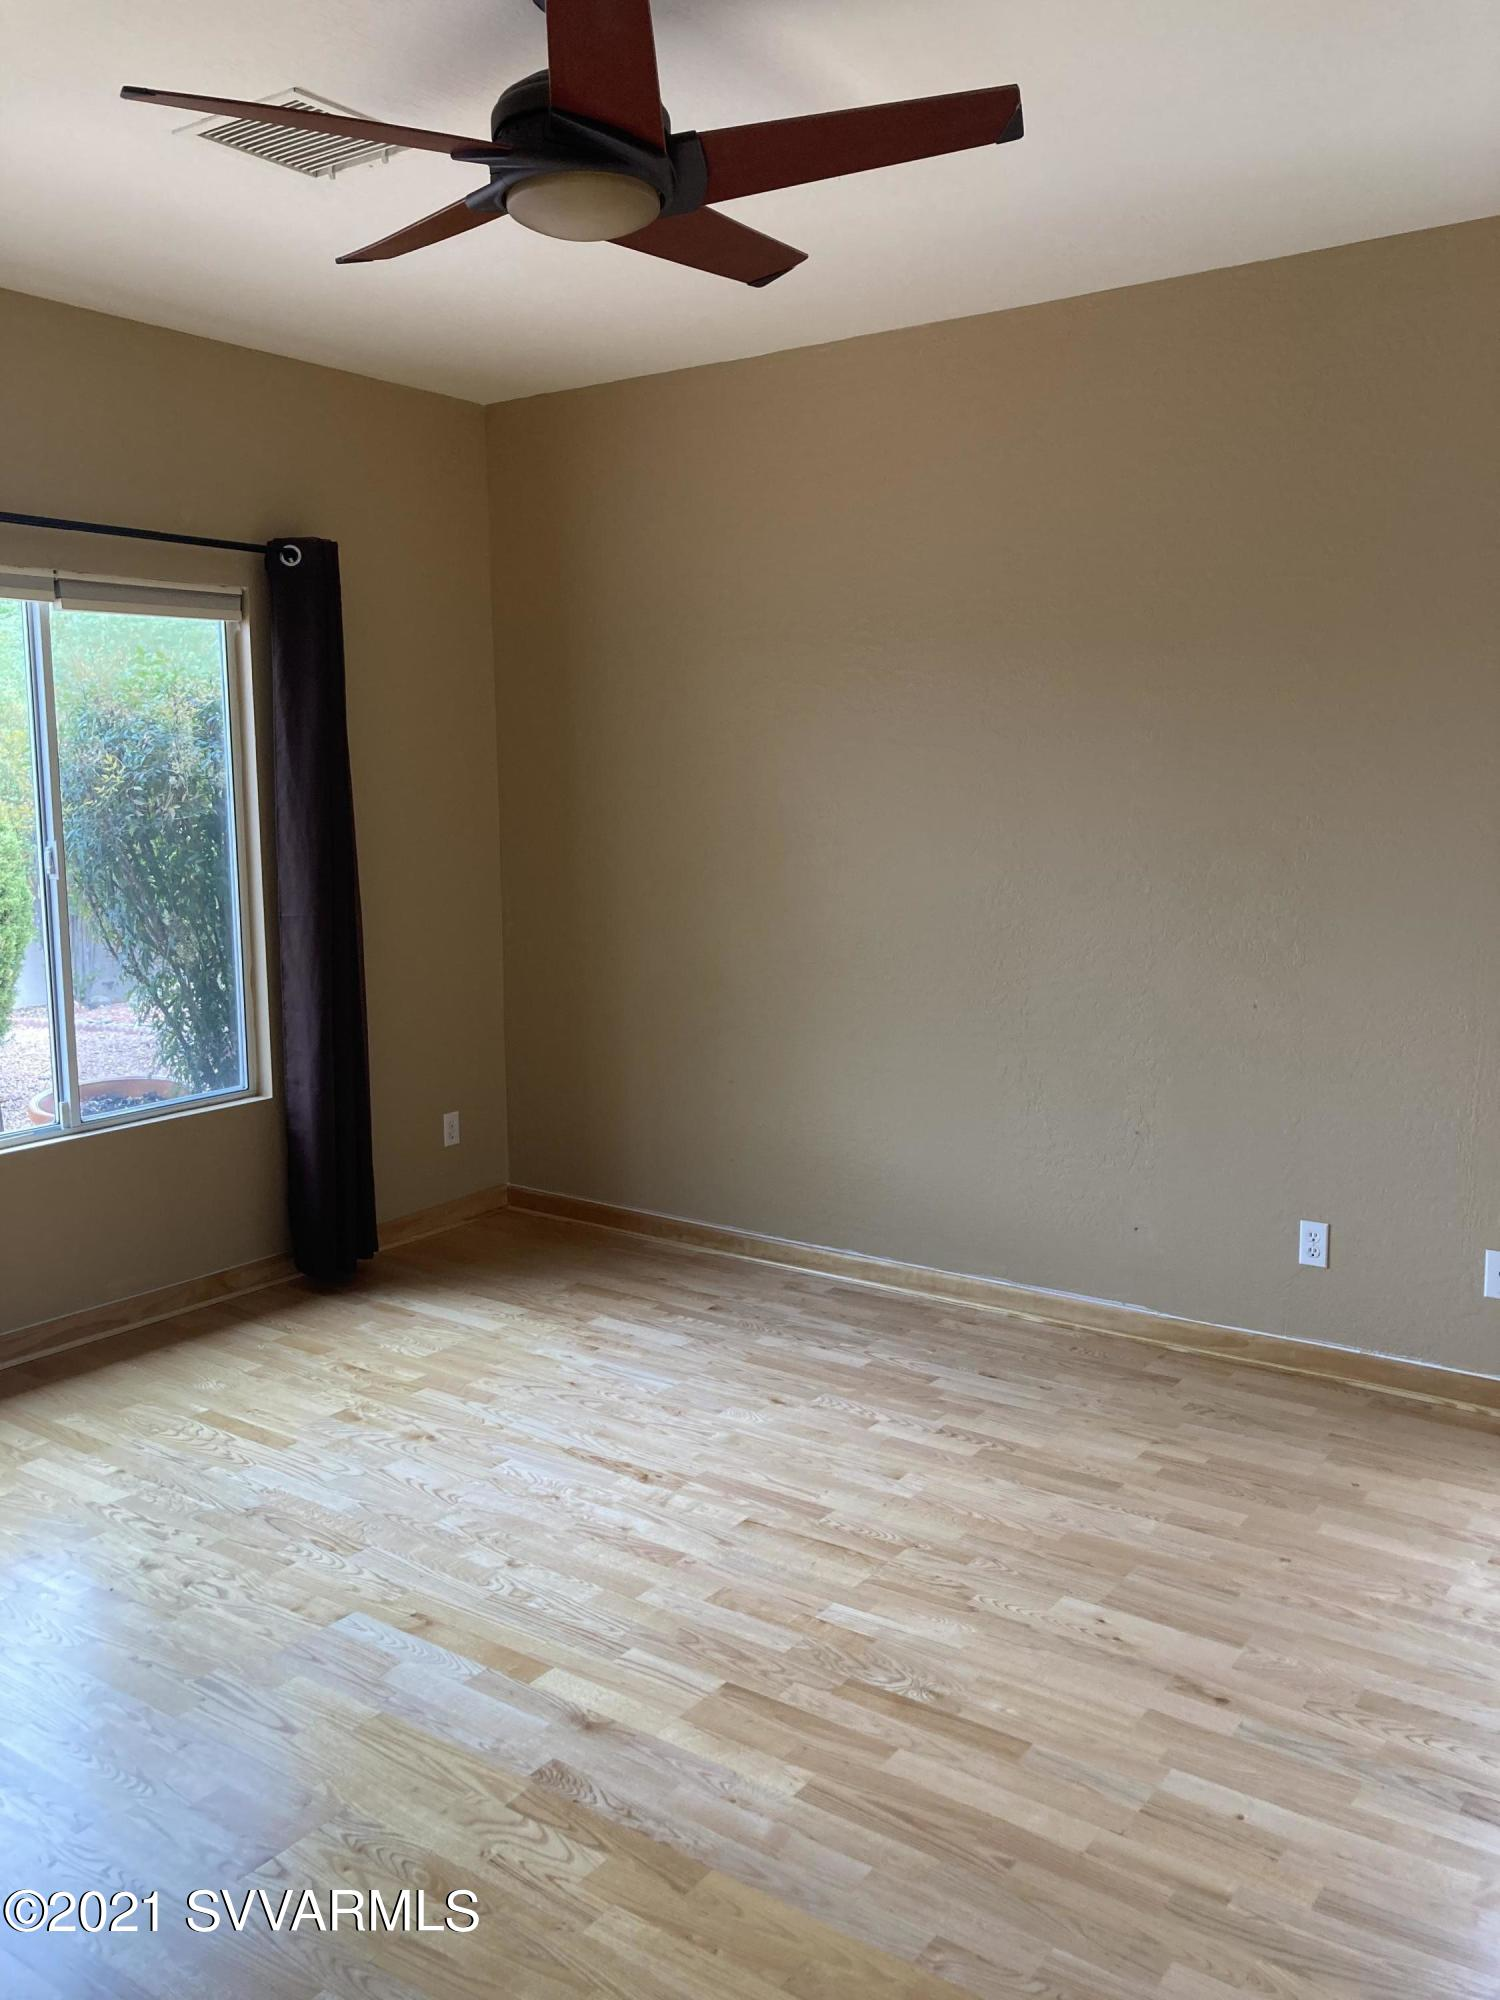 85 S Sagebrush Way Cottonwood, AZ 86326